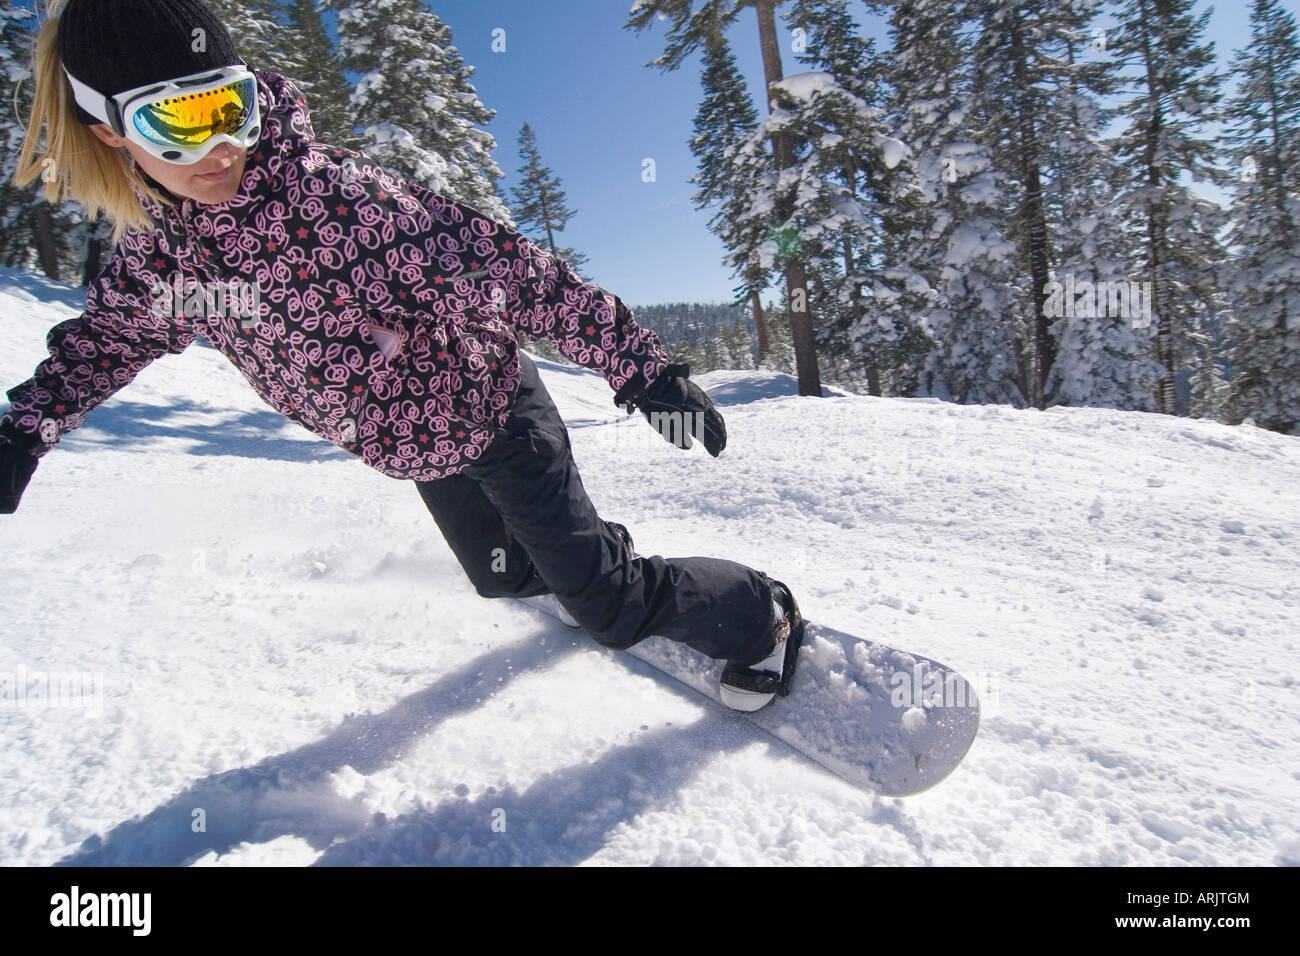 Woman snowboarding, Lake Tahoe, California, USA Stock Photo